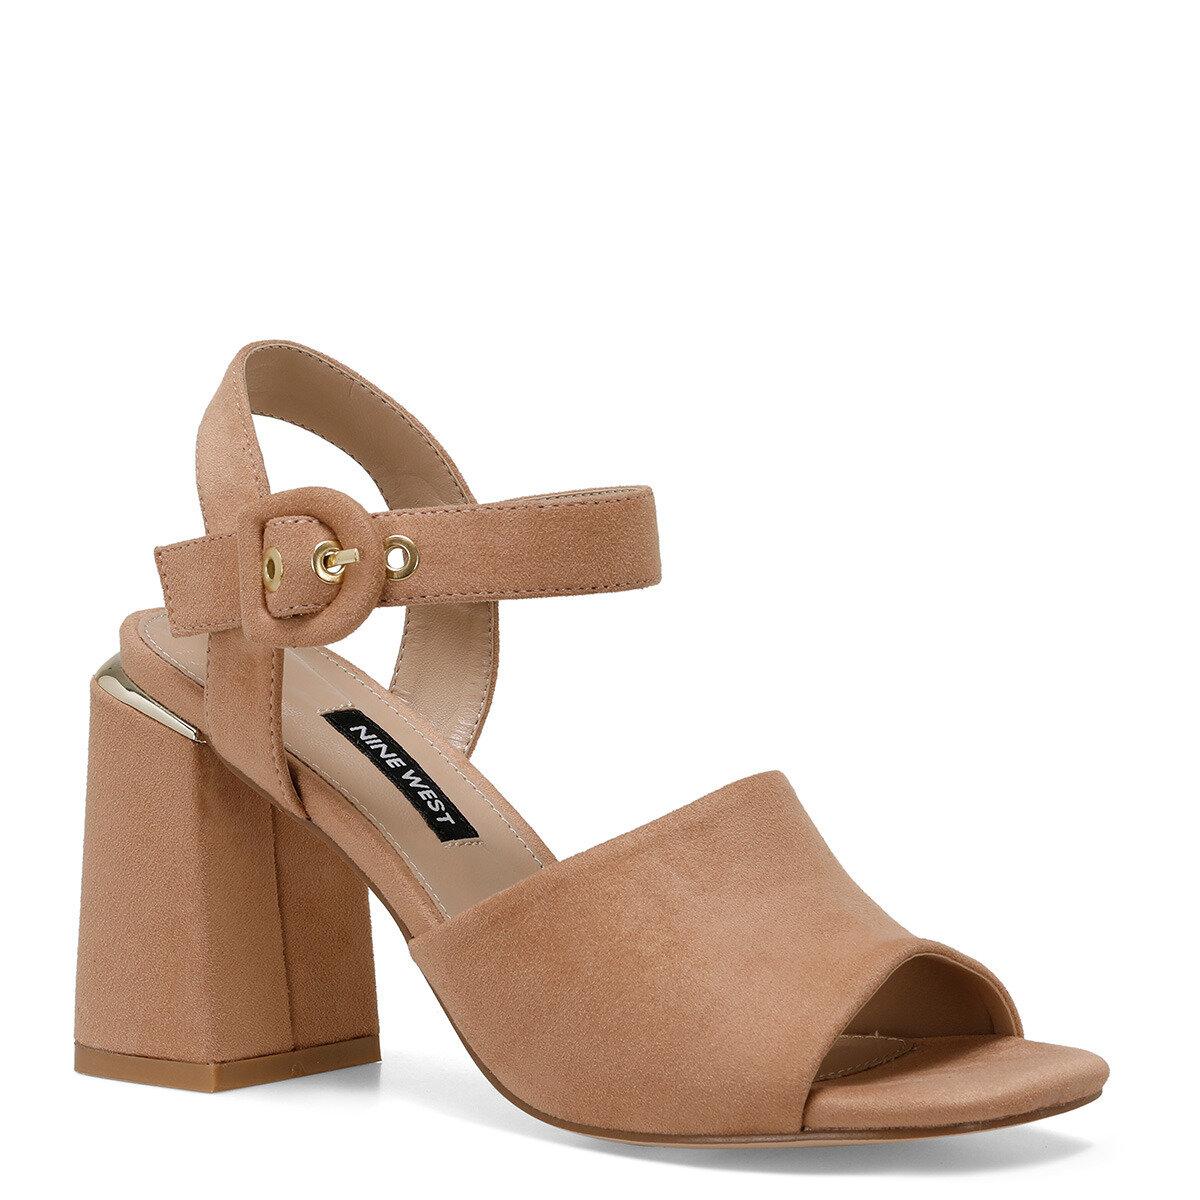 LONELLA Naturel Kadın Topuklu Sandalet